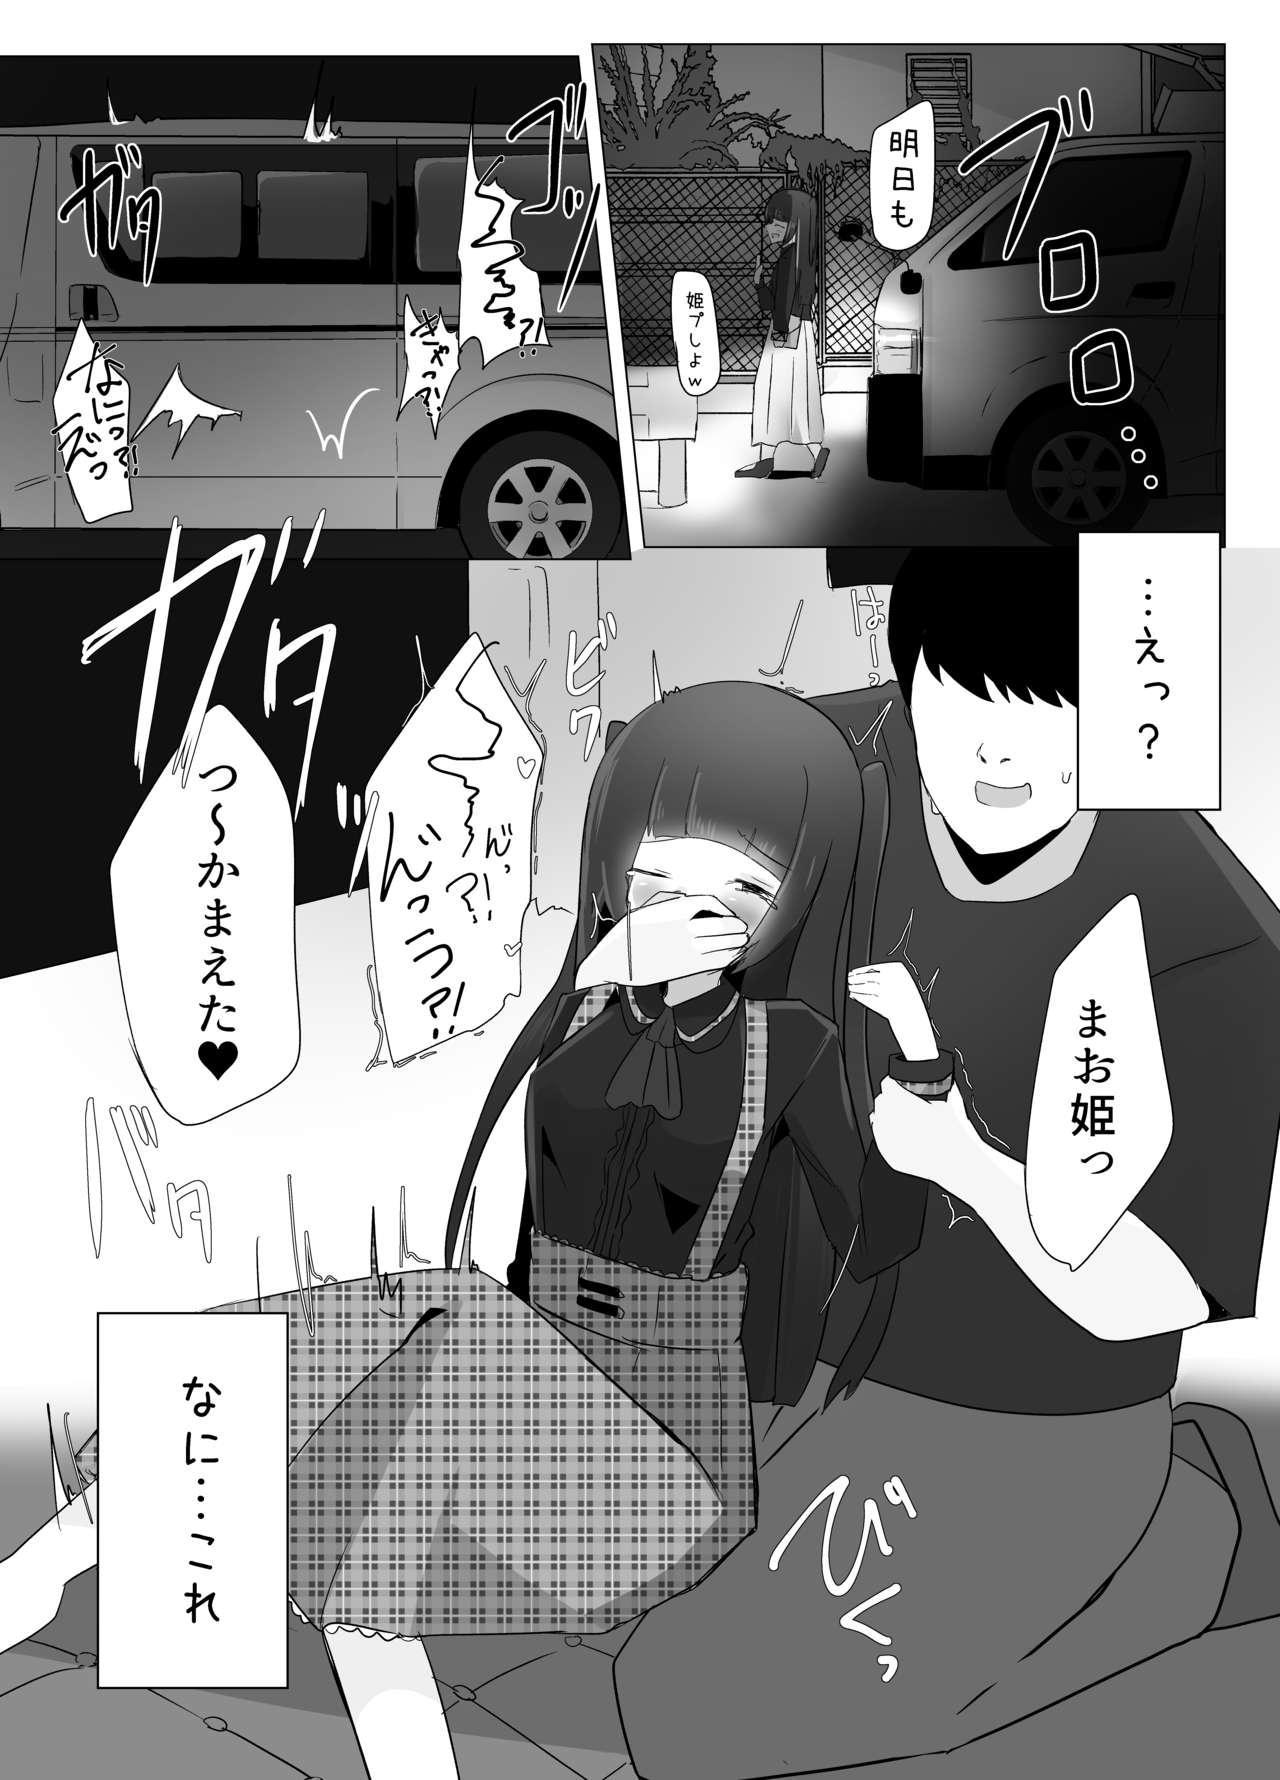 TS Hime wa Okasaretai. 6